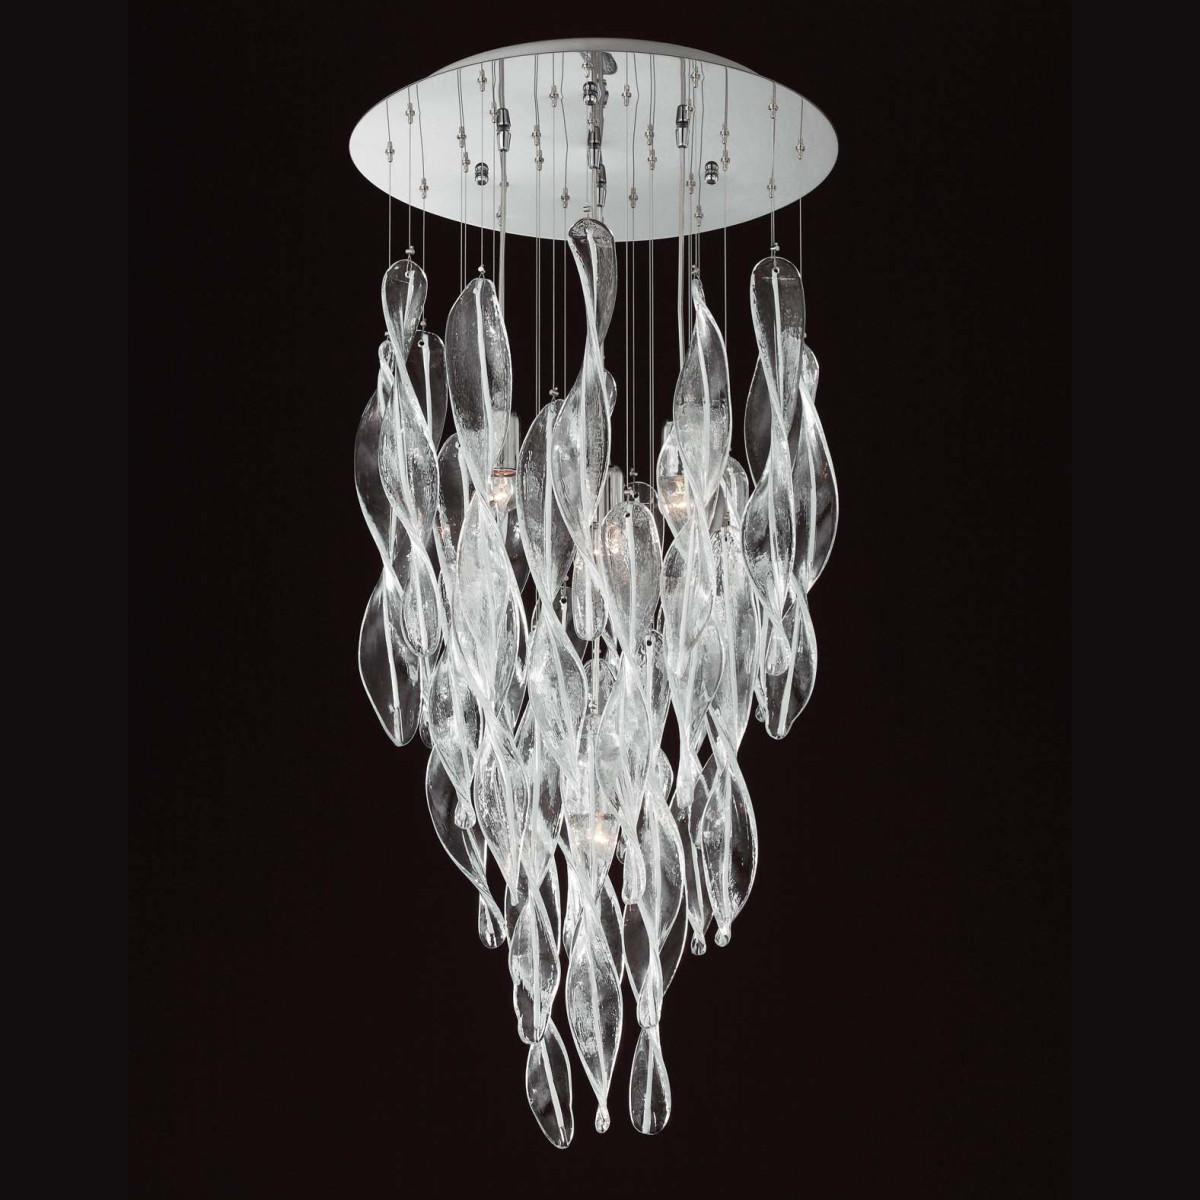 """Elica"" lustre en verre de Murano - 4 lumieres- transparent blanc"